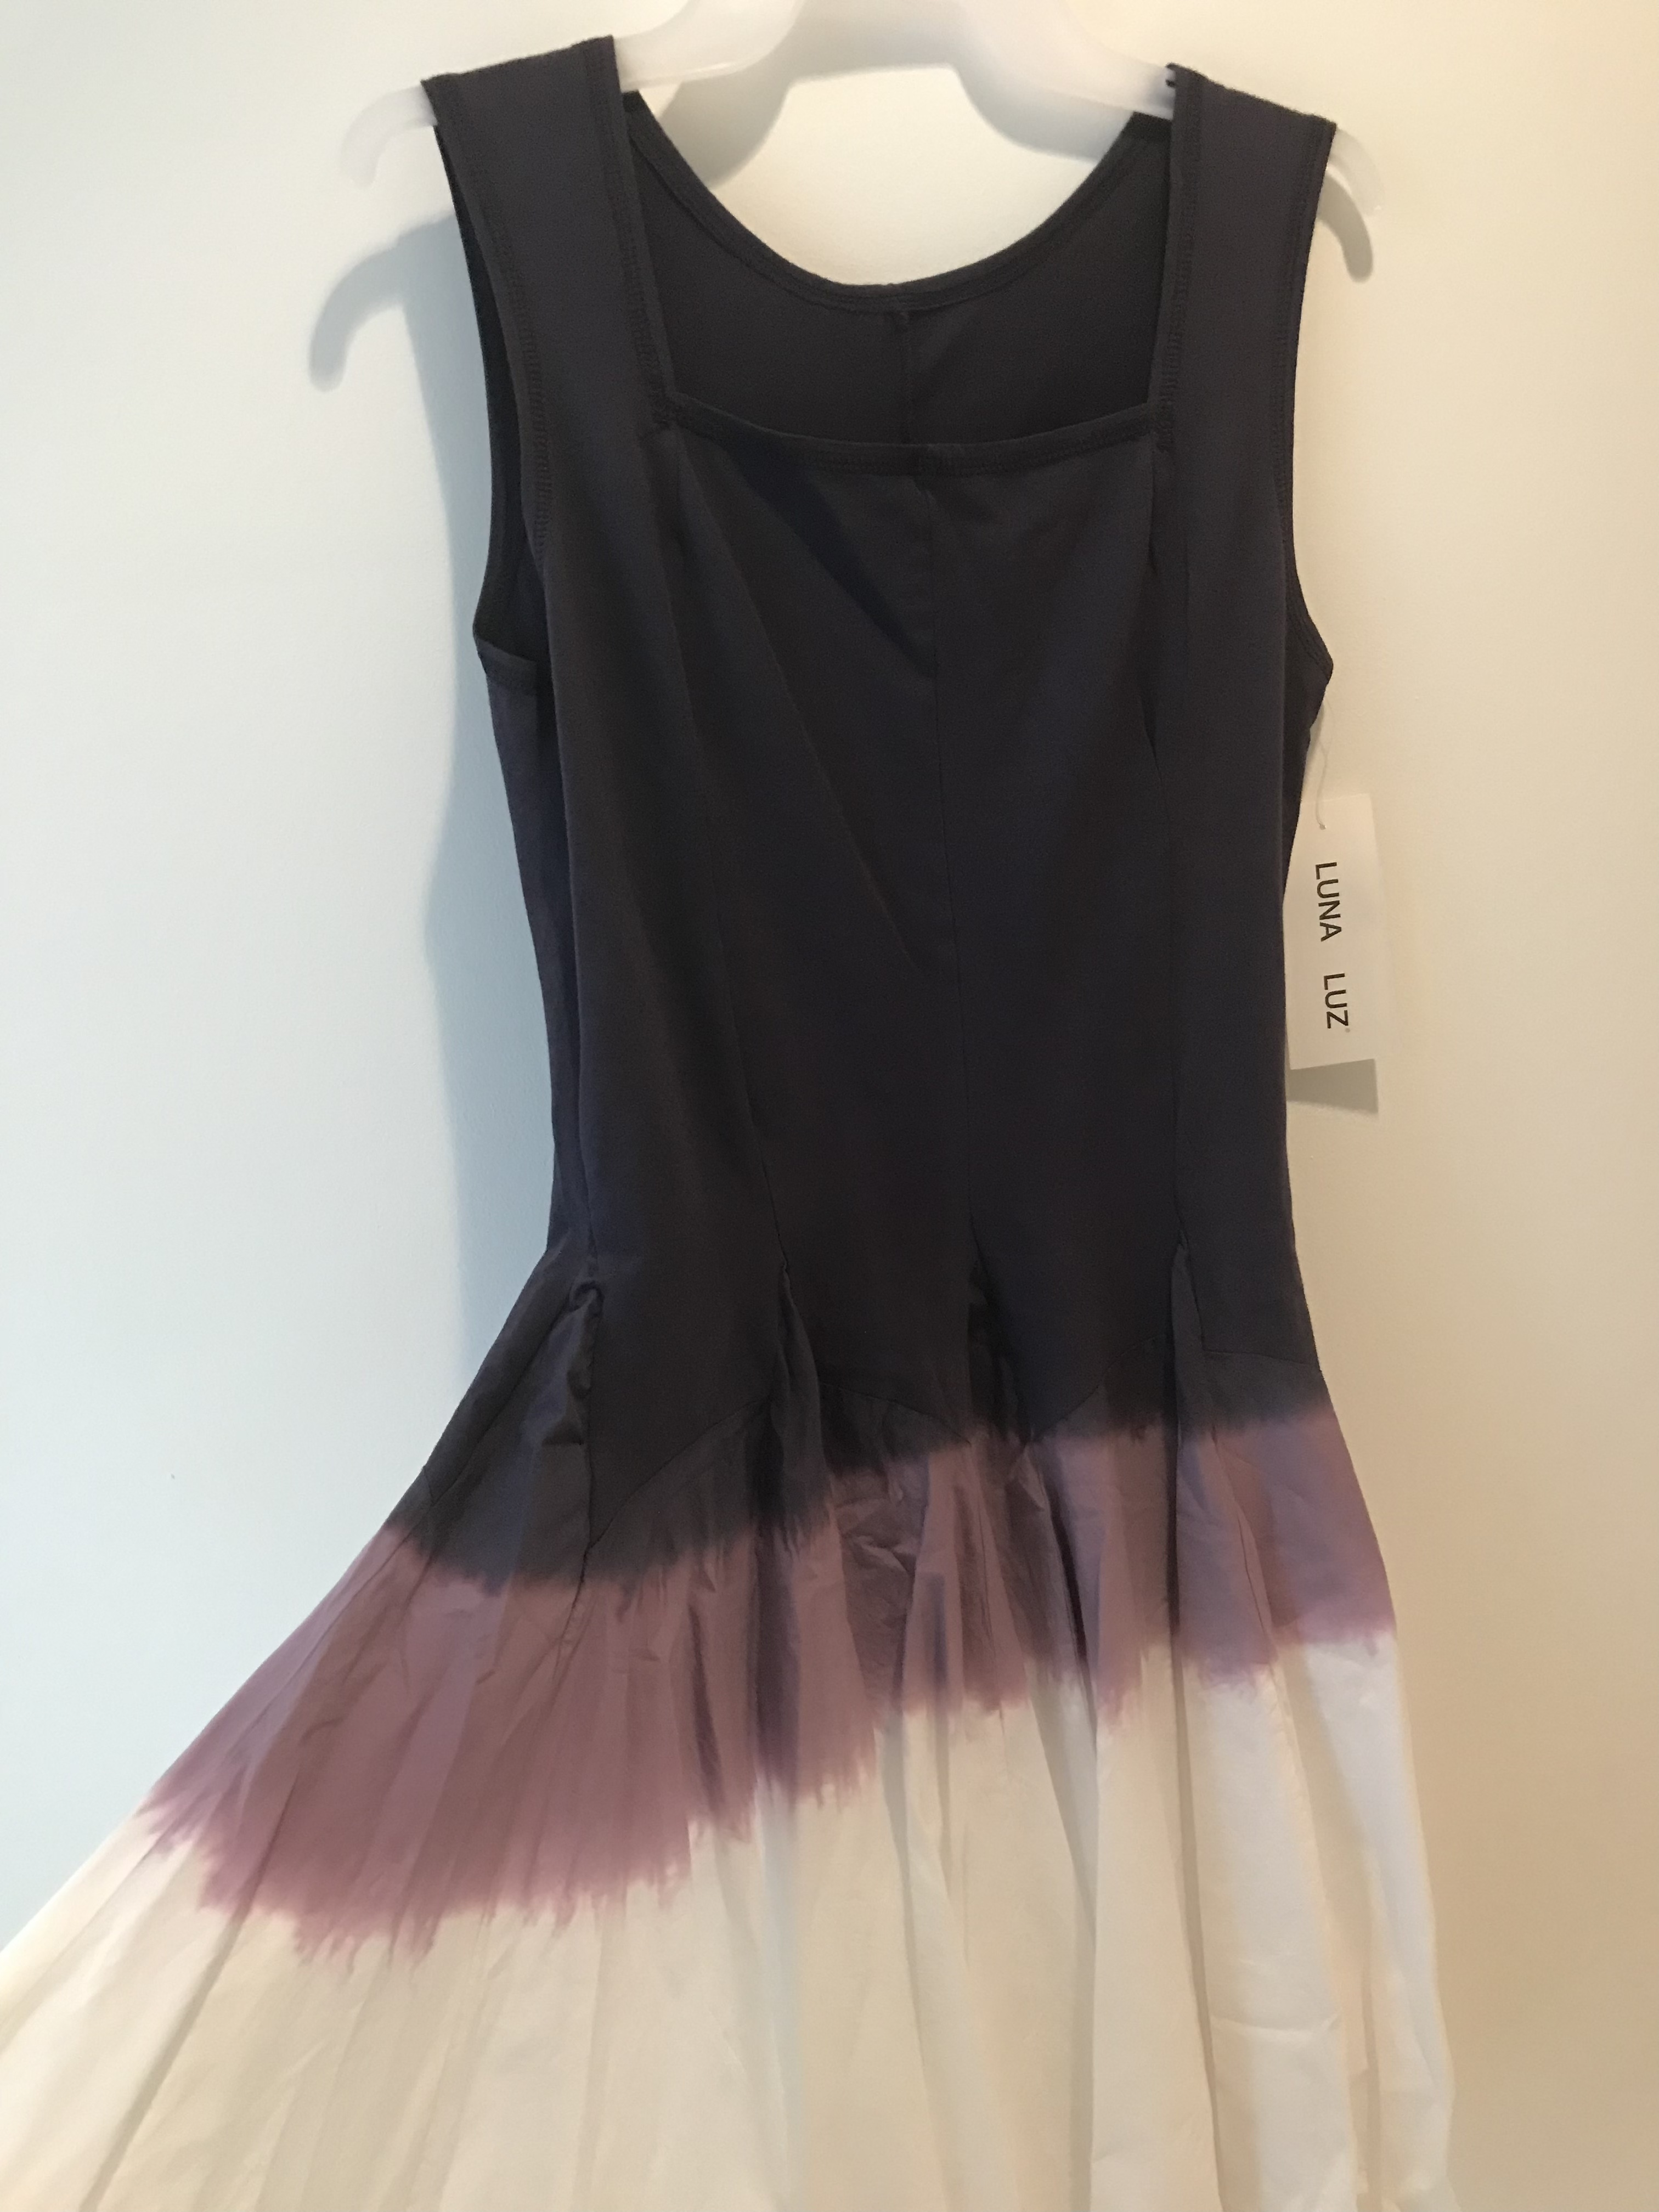 Luna Luz: Square Neck Godet Dyed Tank Dress in Iris Ombre (Ships Immed, 2 Left!)